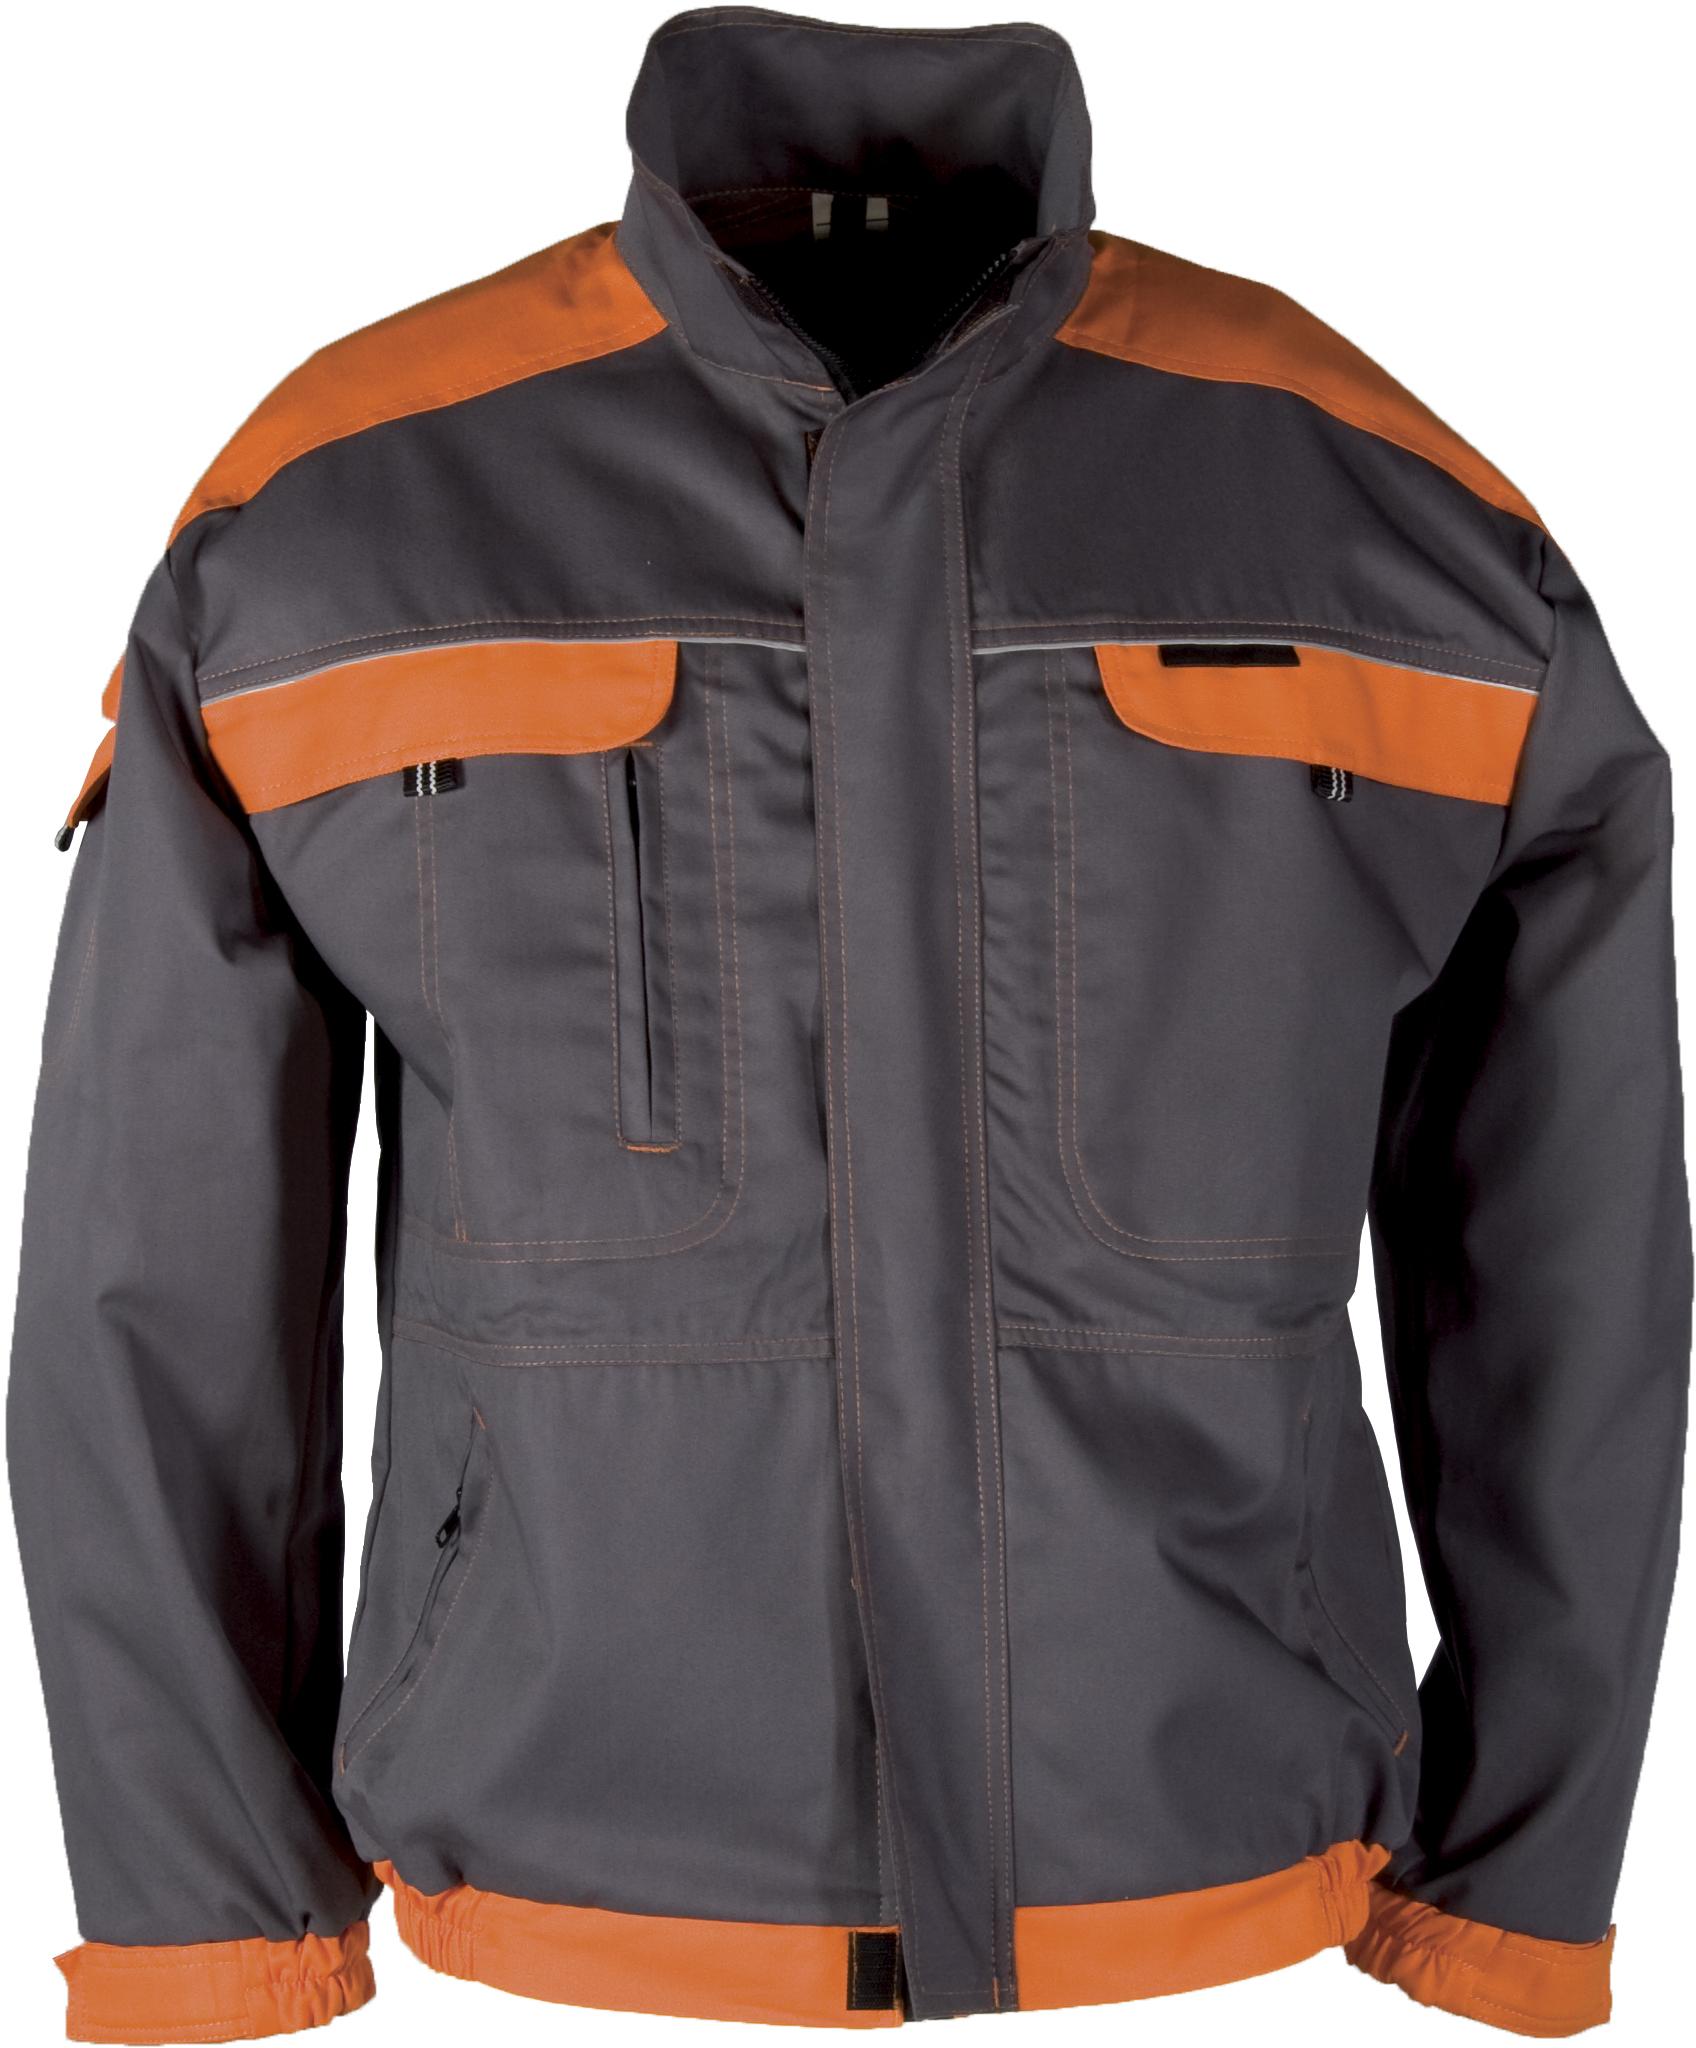 Radna jakna COOL TREND sivo/narančasta